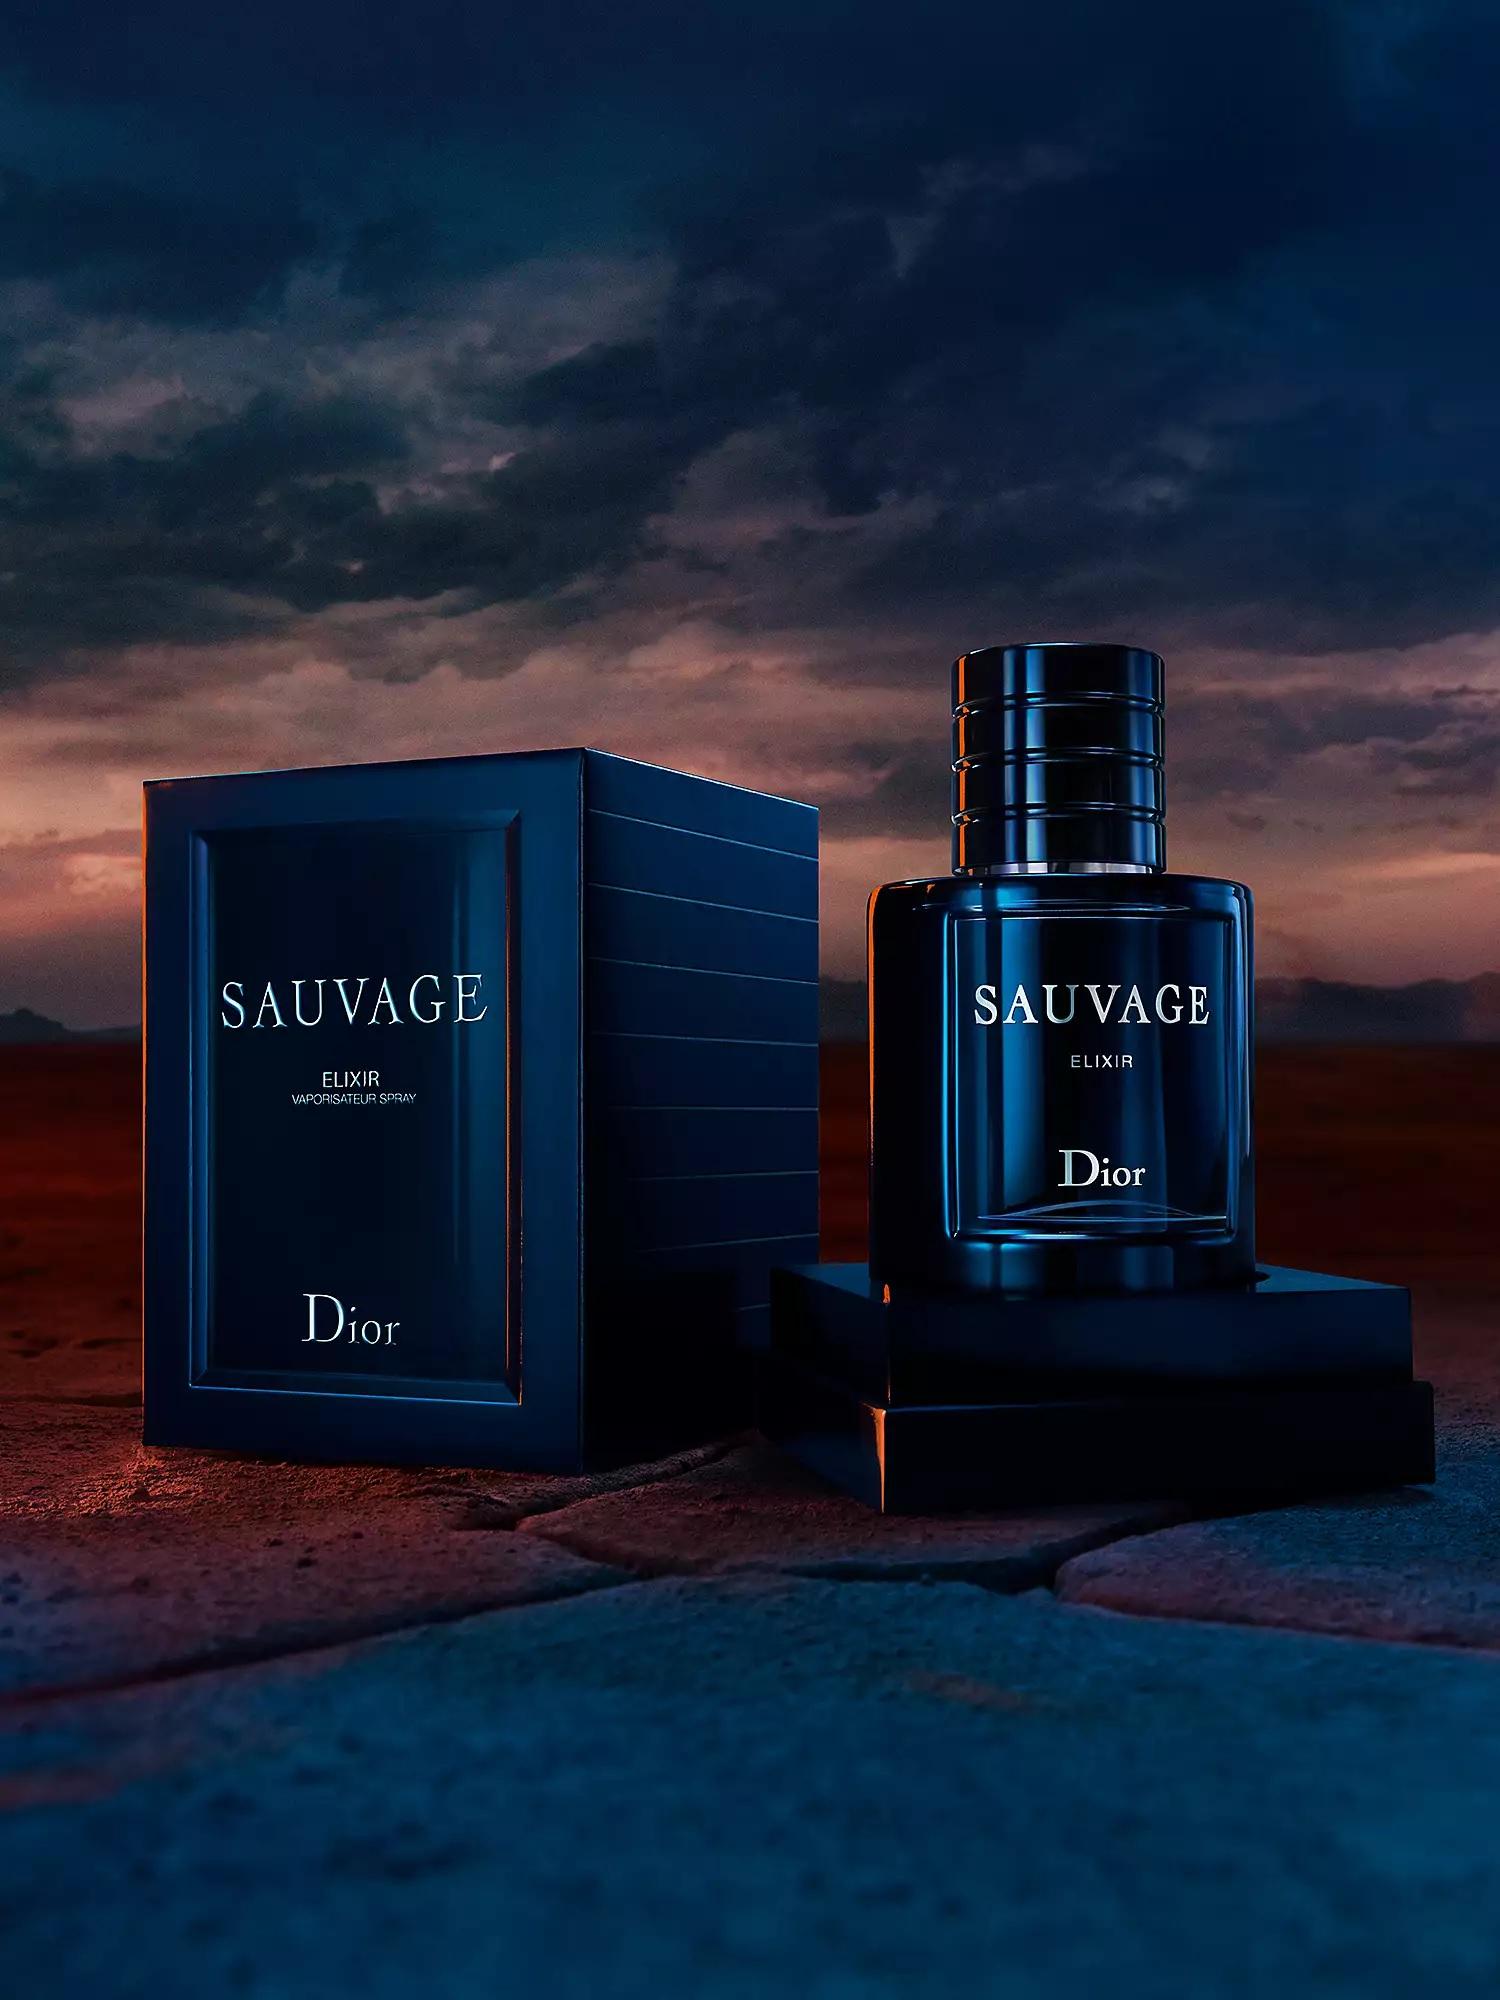 sauvage elixir